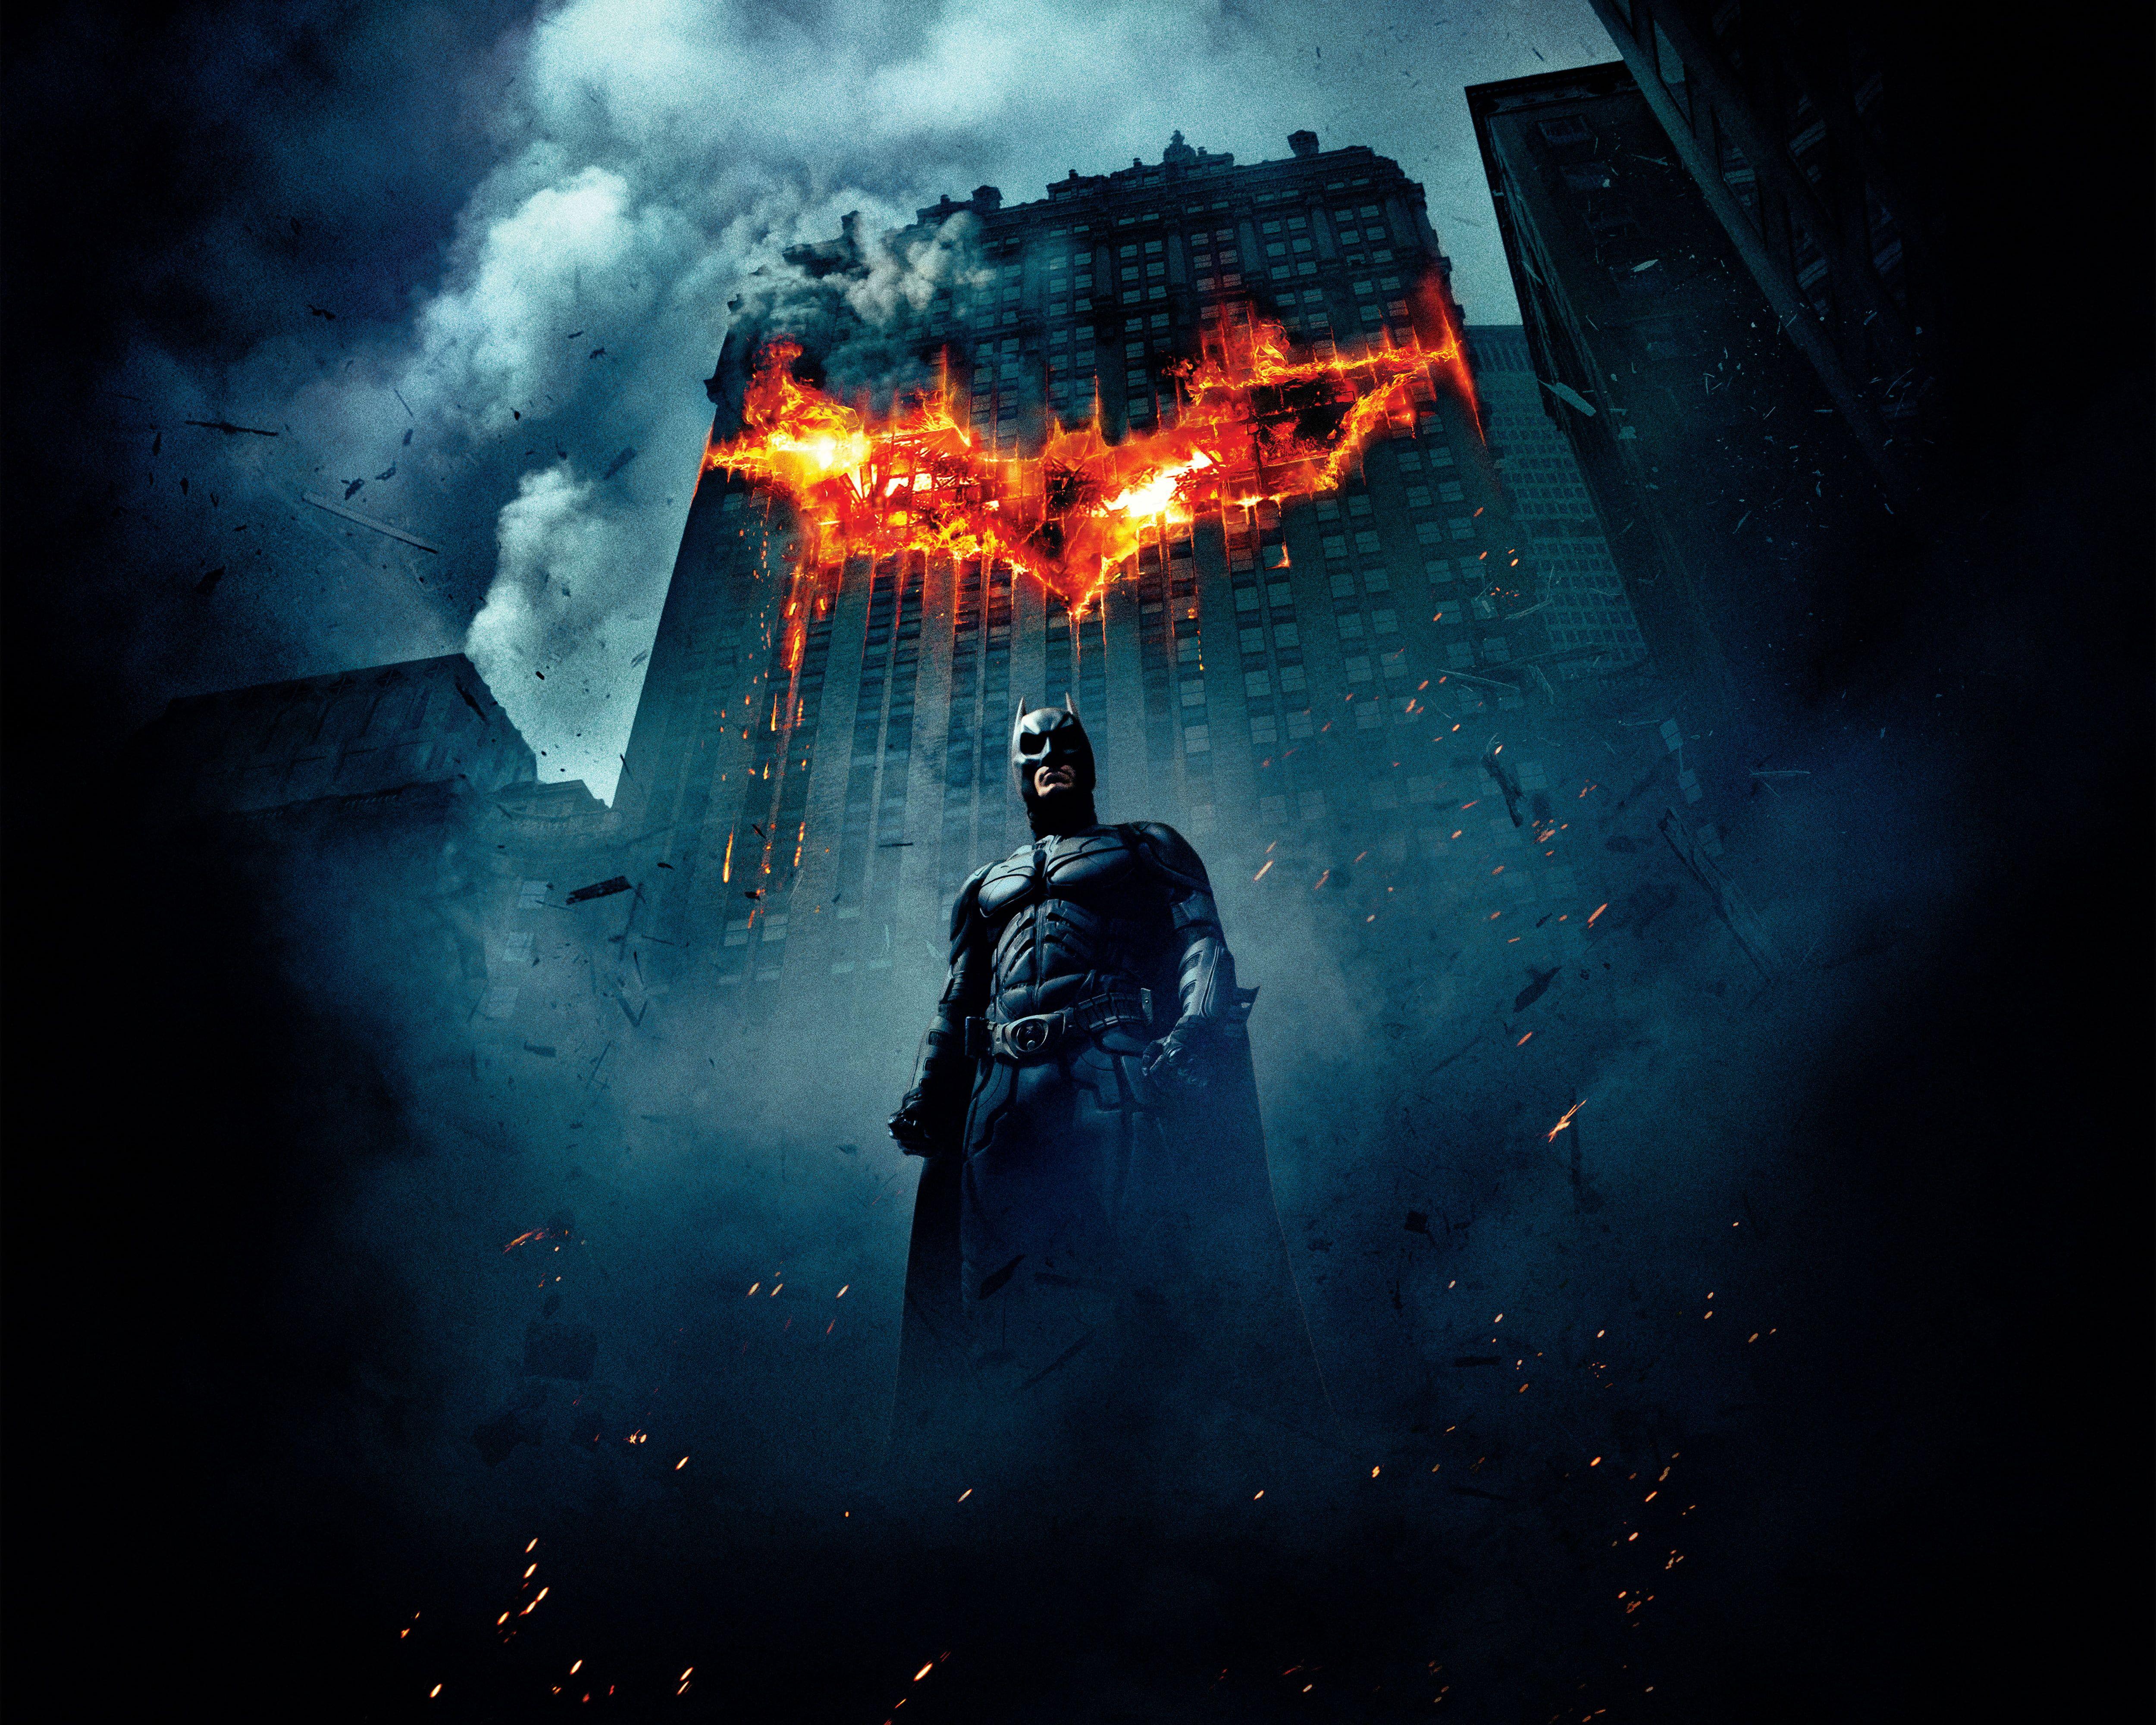 The Dark Knight Legendary Pictures The Dark Knight Rises DC Comics 20th Century Fox Batman Begins C